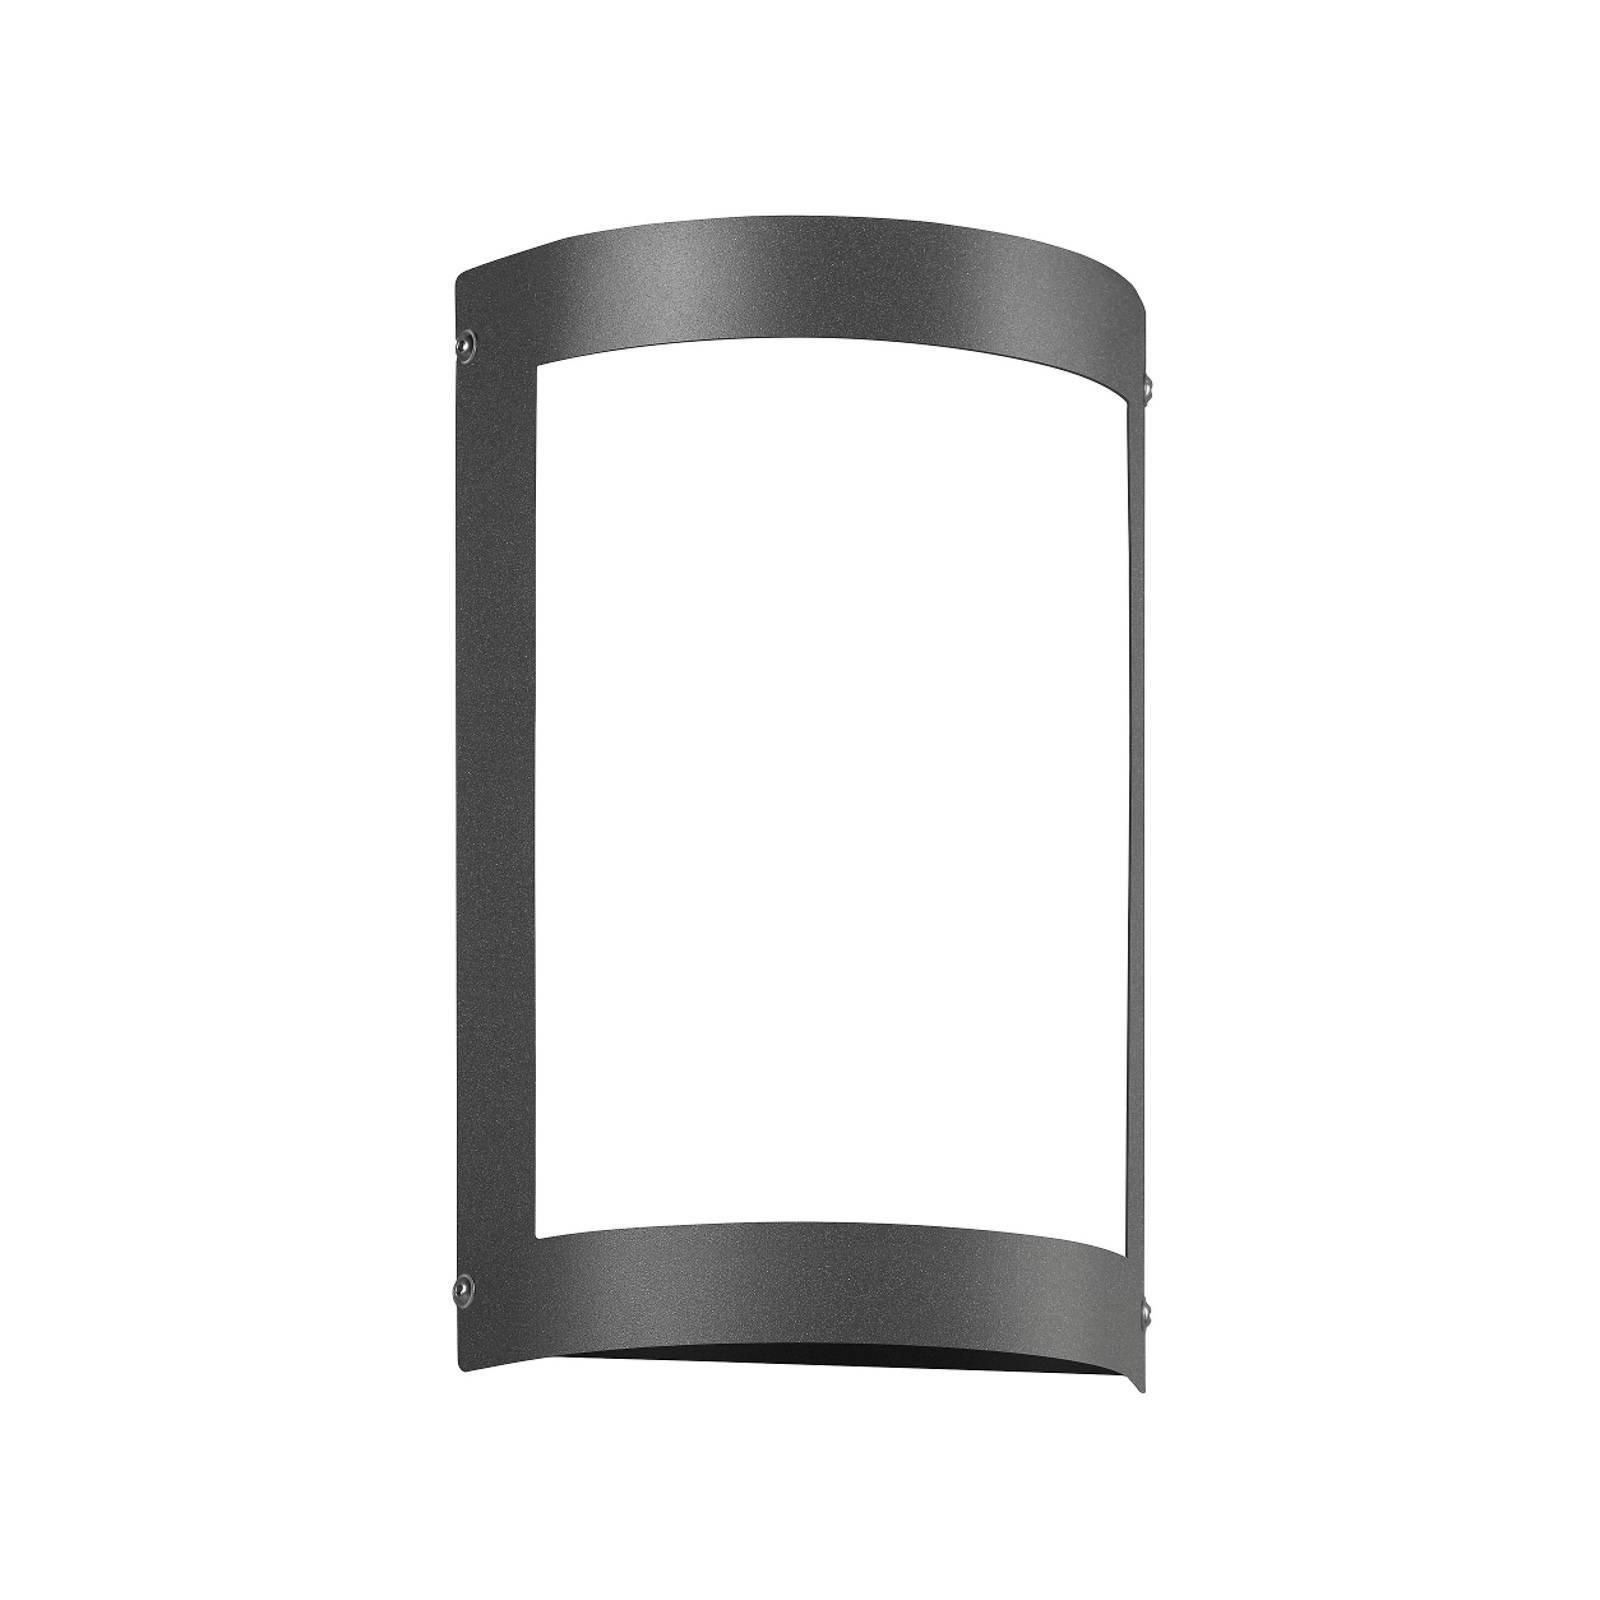 Sensor-LED-lampe Aqua Marco, antrasitt